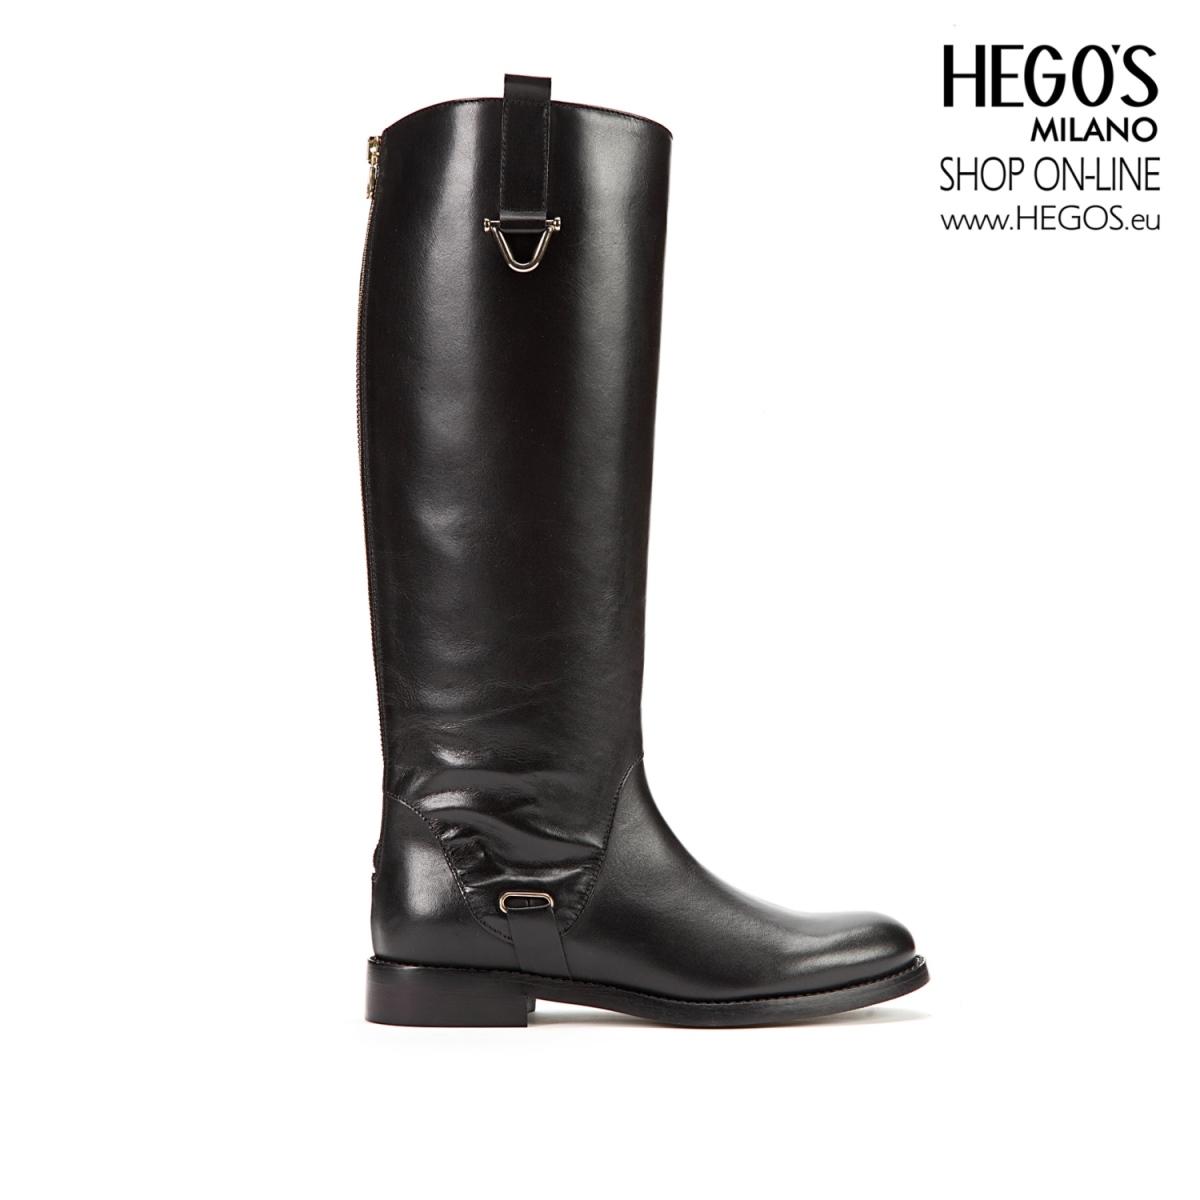 22800_HEGOS_MILANO_699 (1)